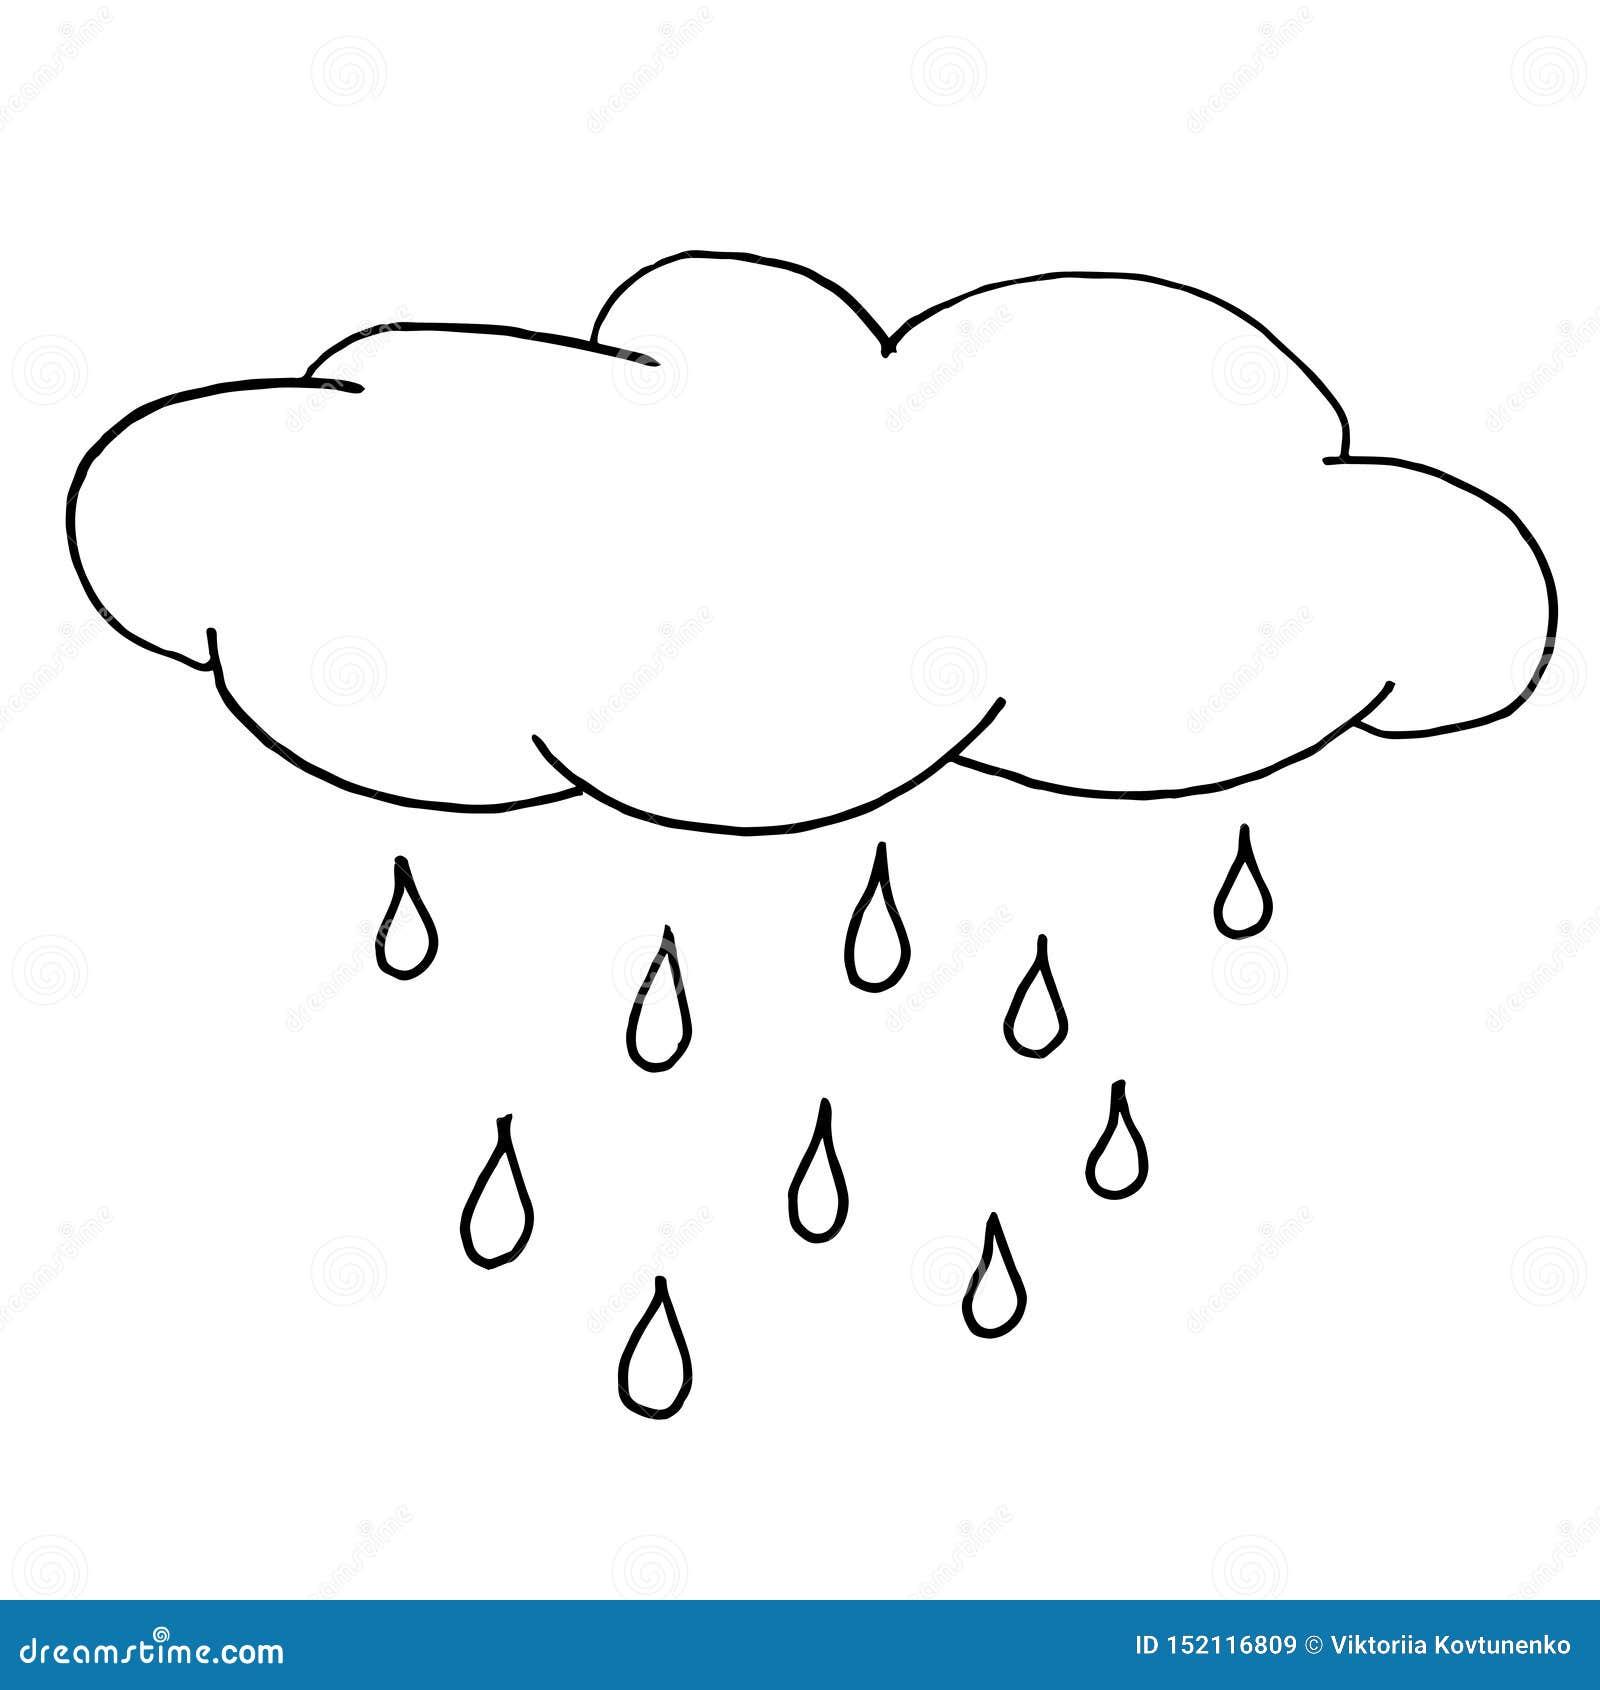 Autumn rainy cloud monochrome sketch hand drawing black